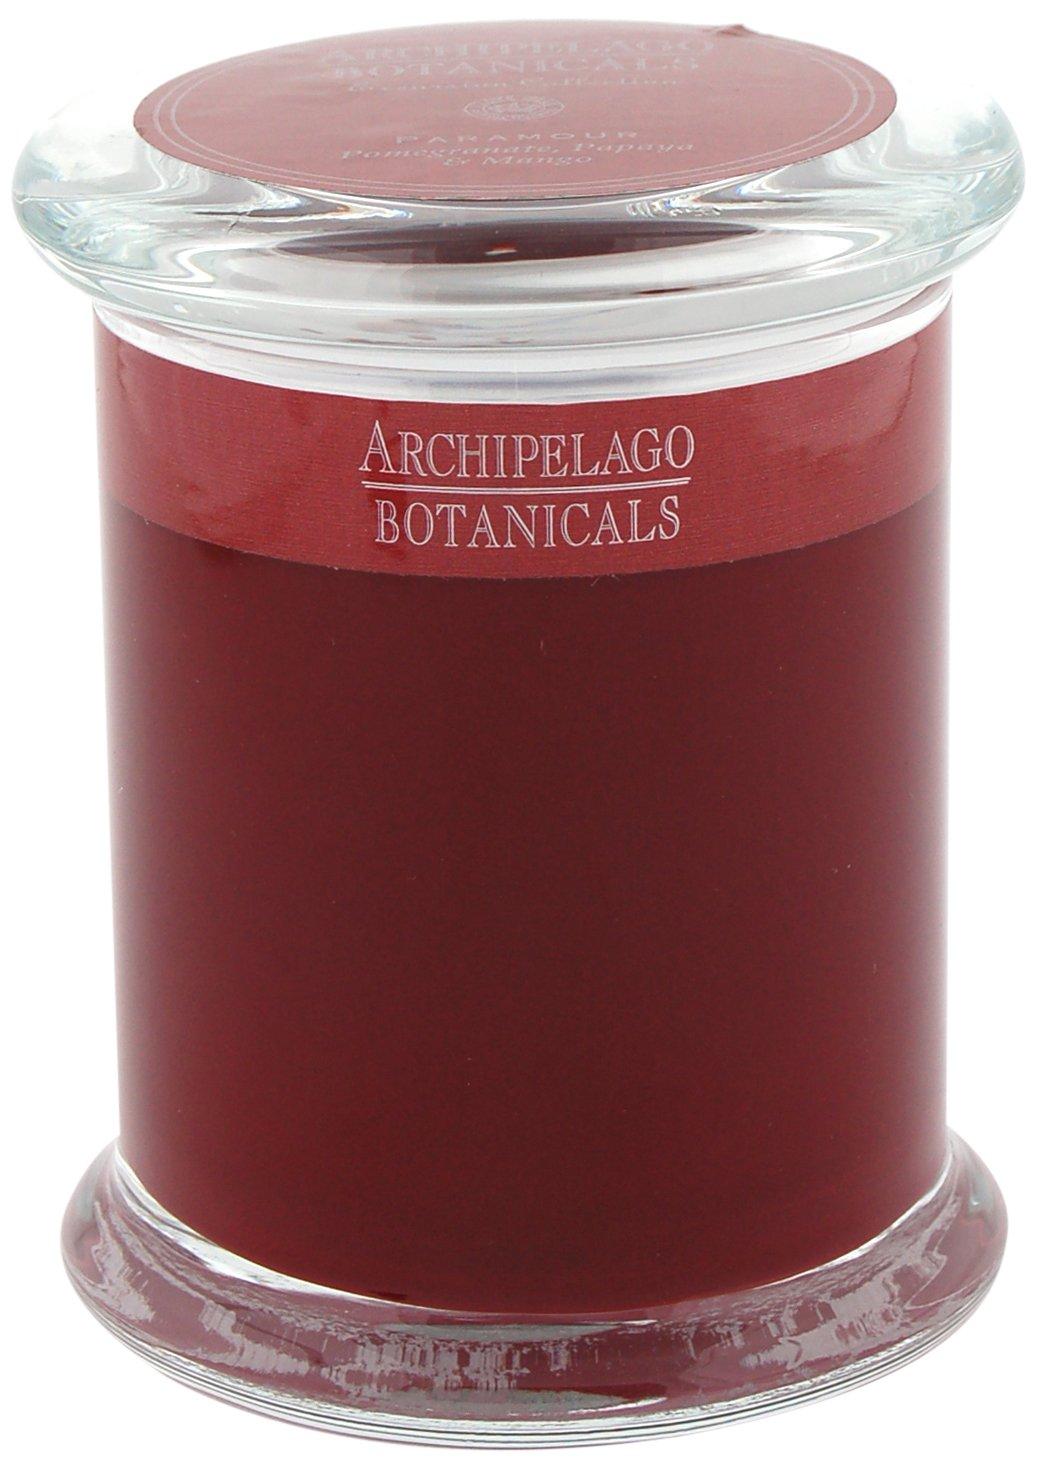 ARCHIPELAGO BOTANICALS Excursions Jar Candle 244 g Luna 244 g 11691